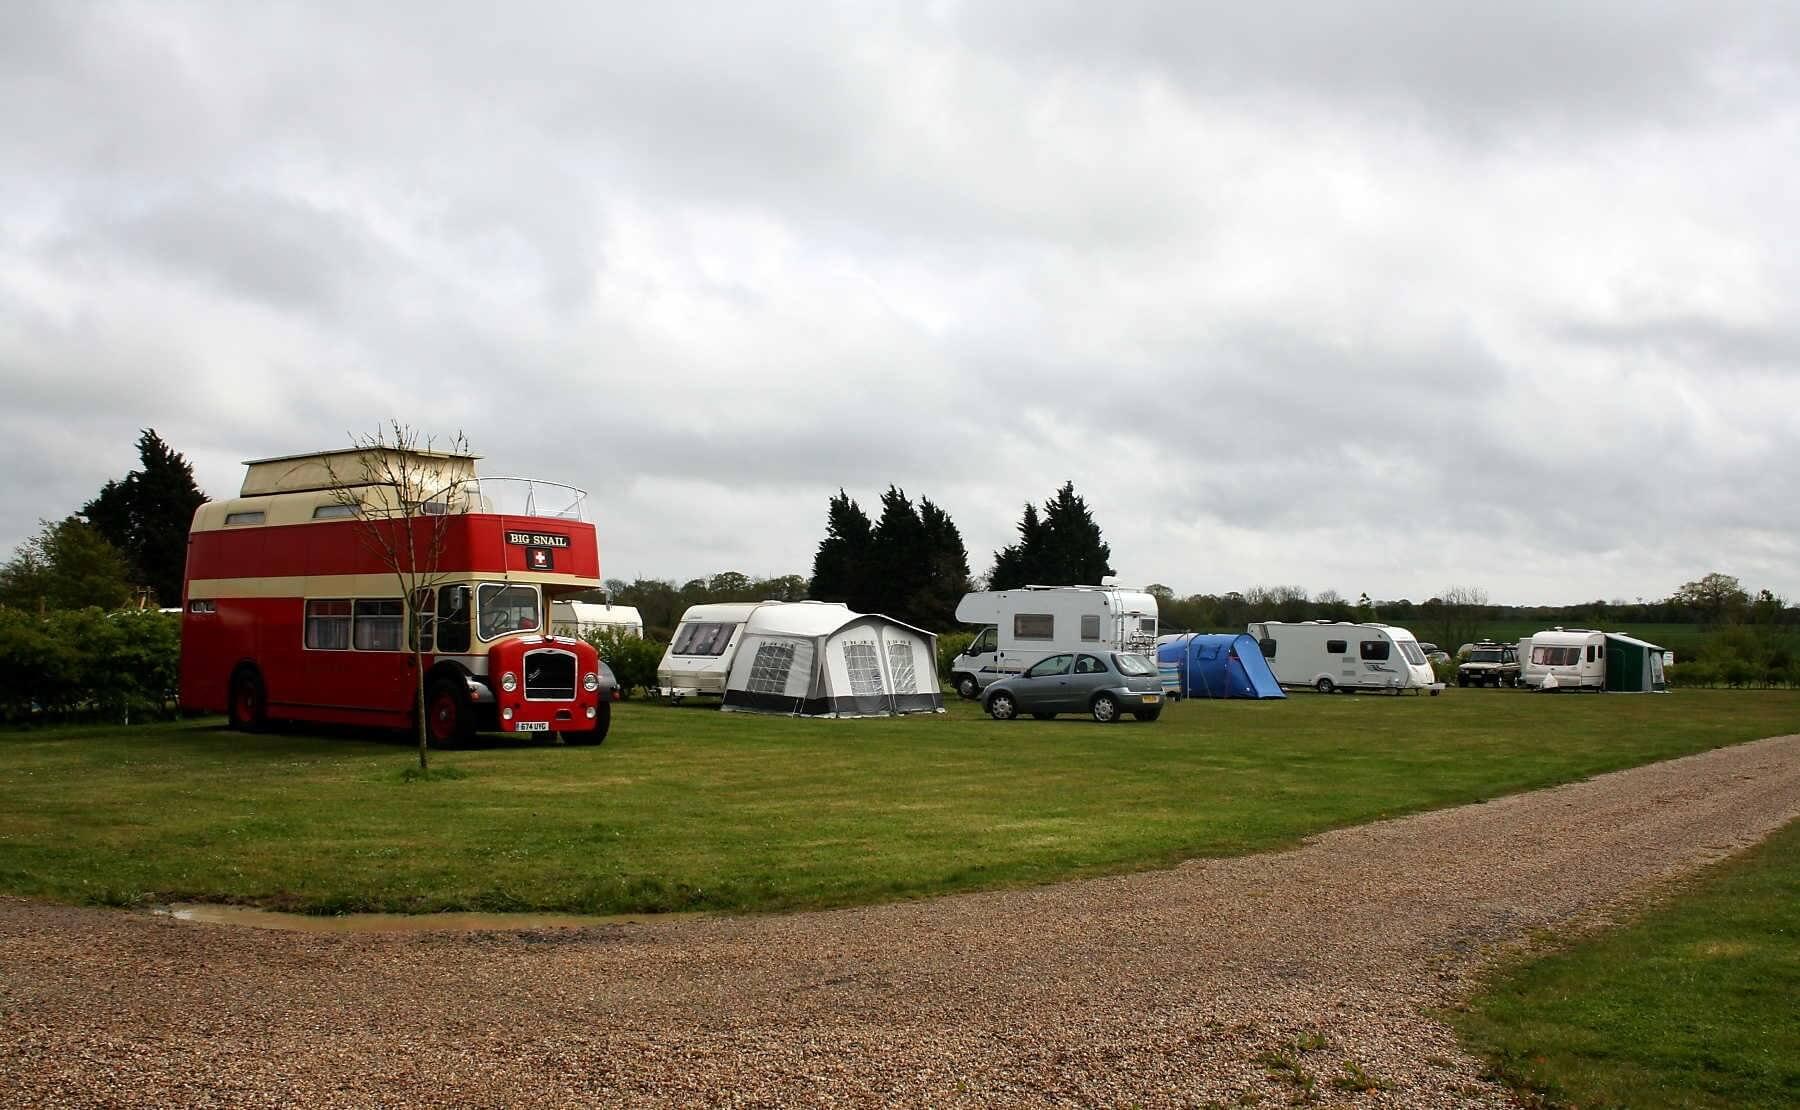 Haw Wood Farm Caravan & Camping Park, Darsham, Suffolk  | Head Outside